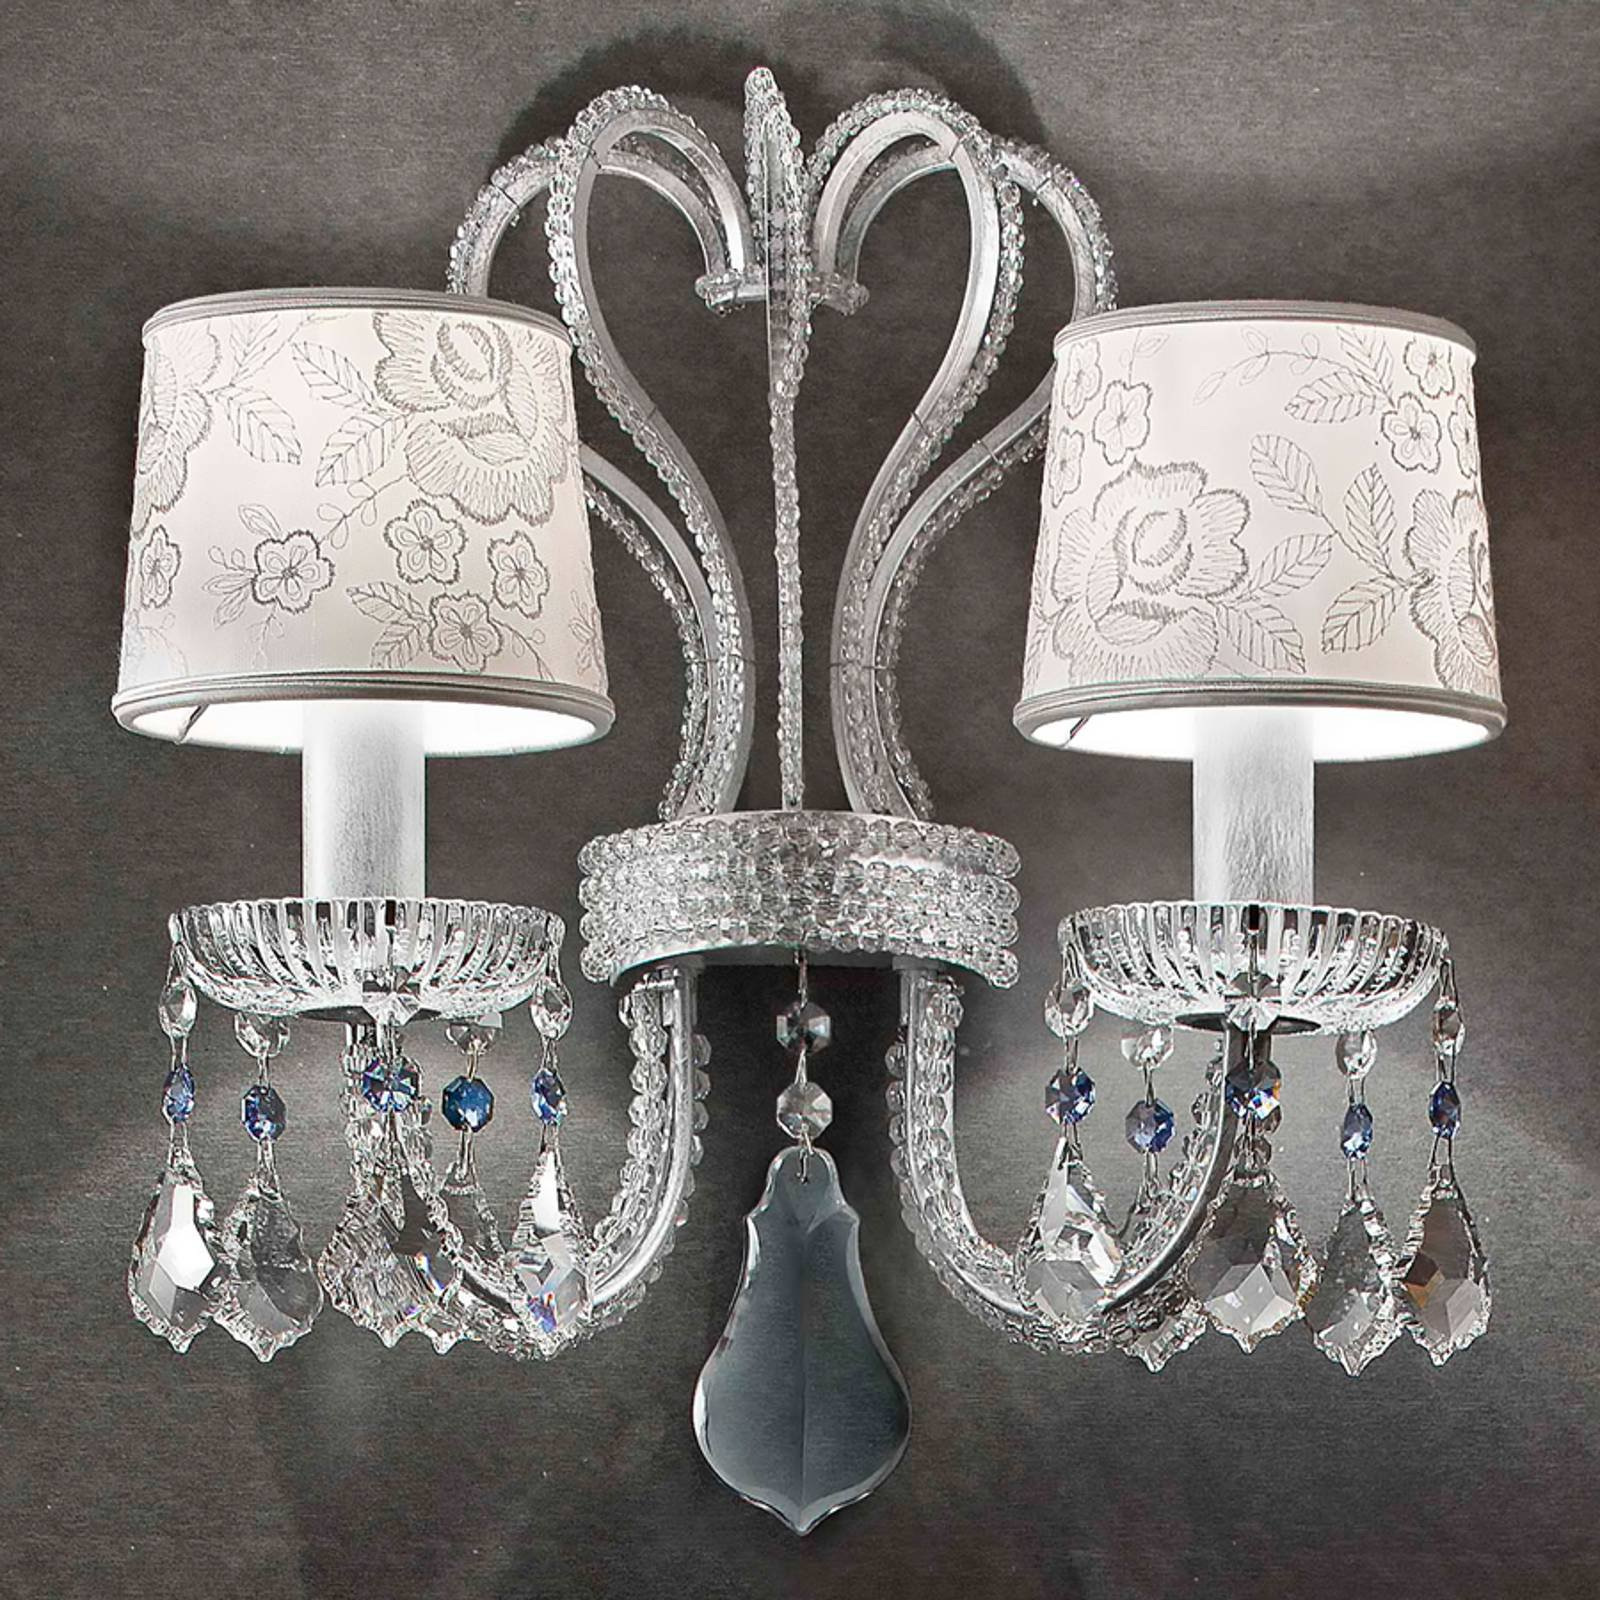 Galà vegglampe i hvit og sølv, 2 lyskilder